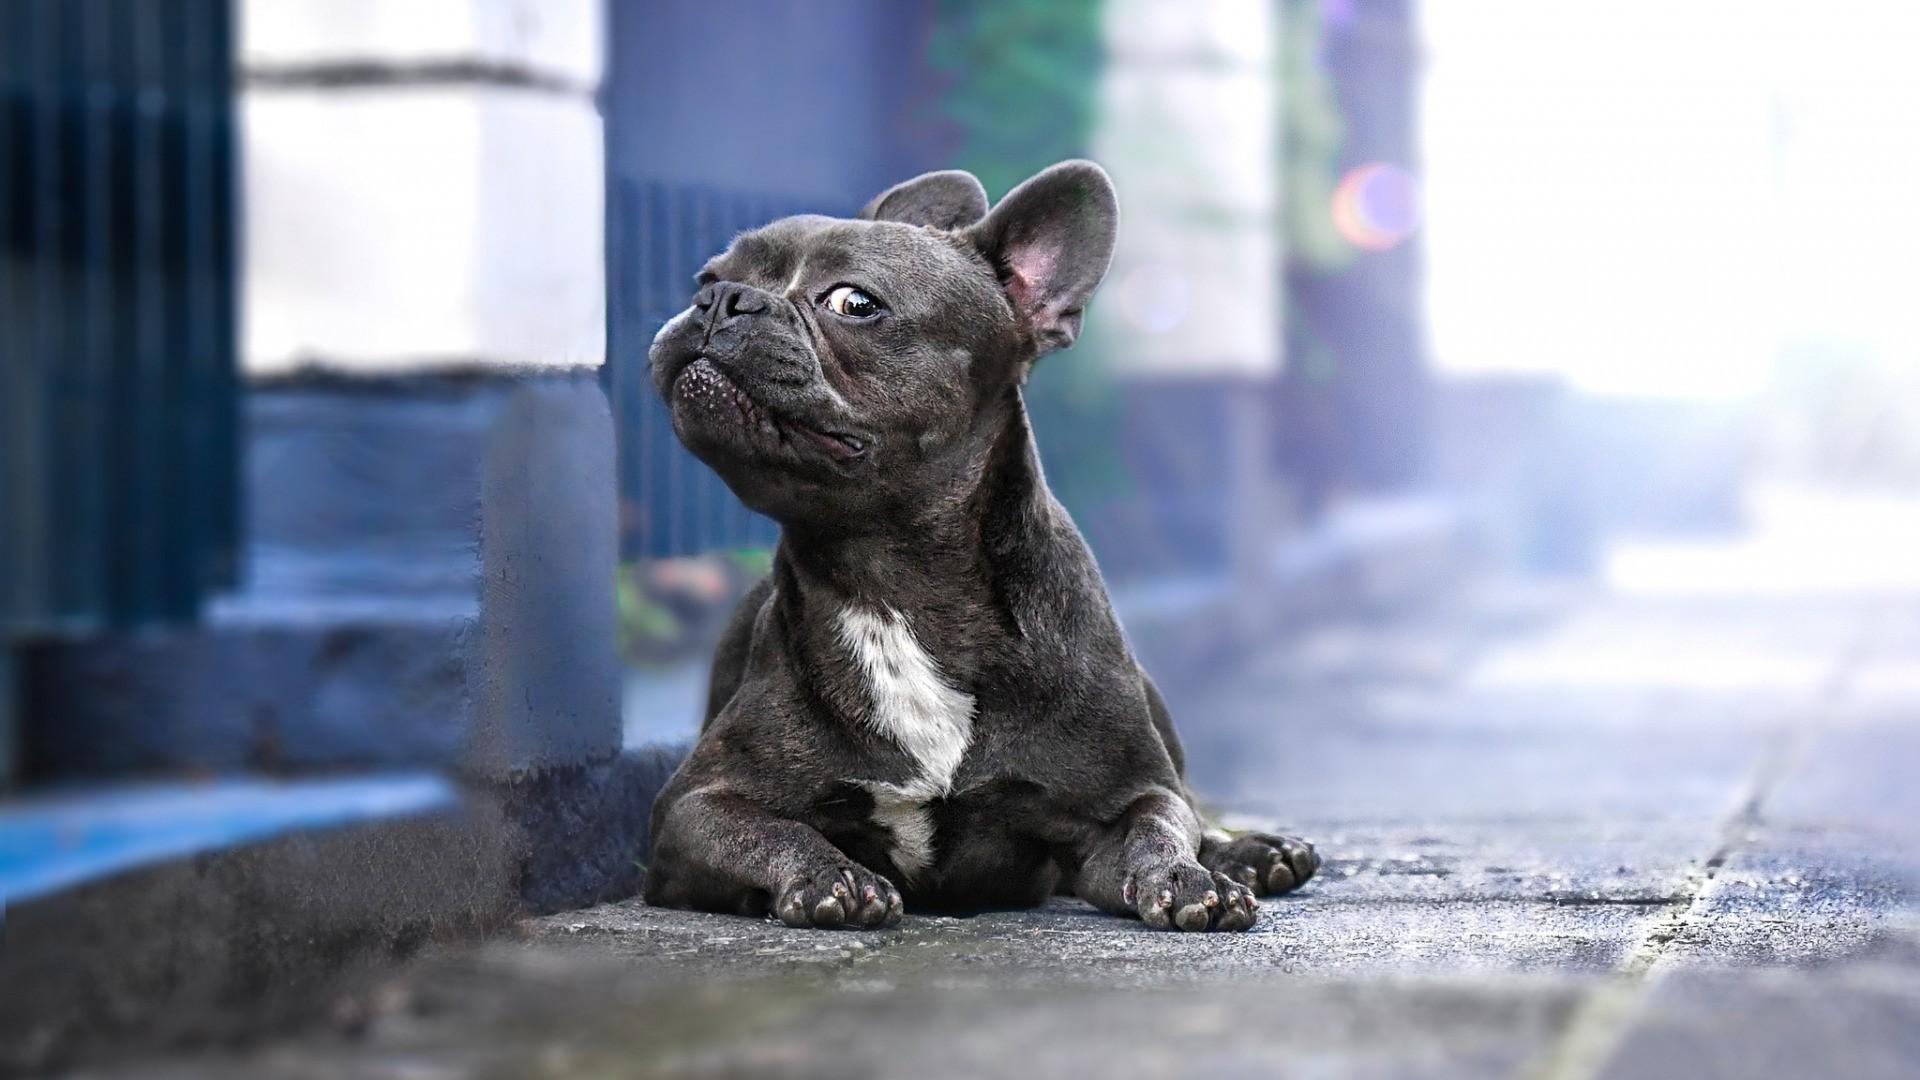 French Bulldog wallpaper photo hd